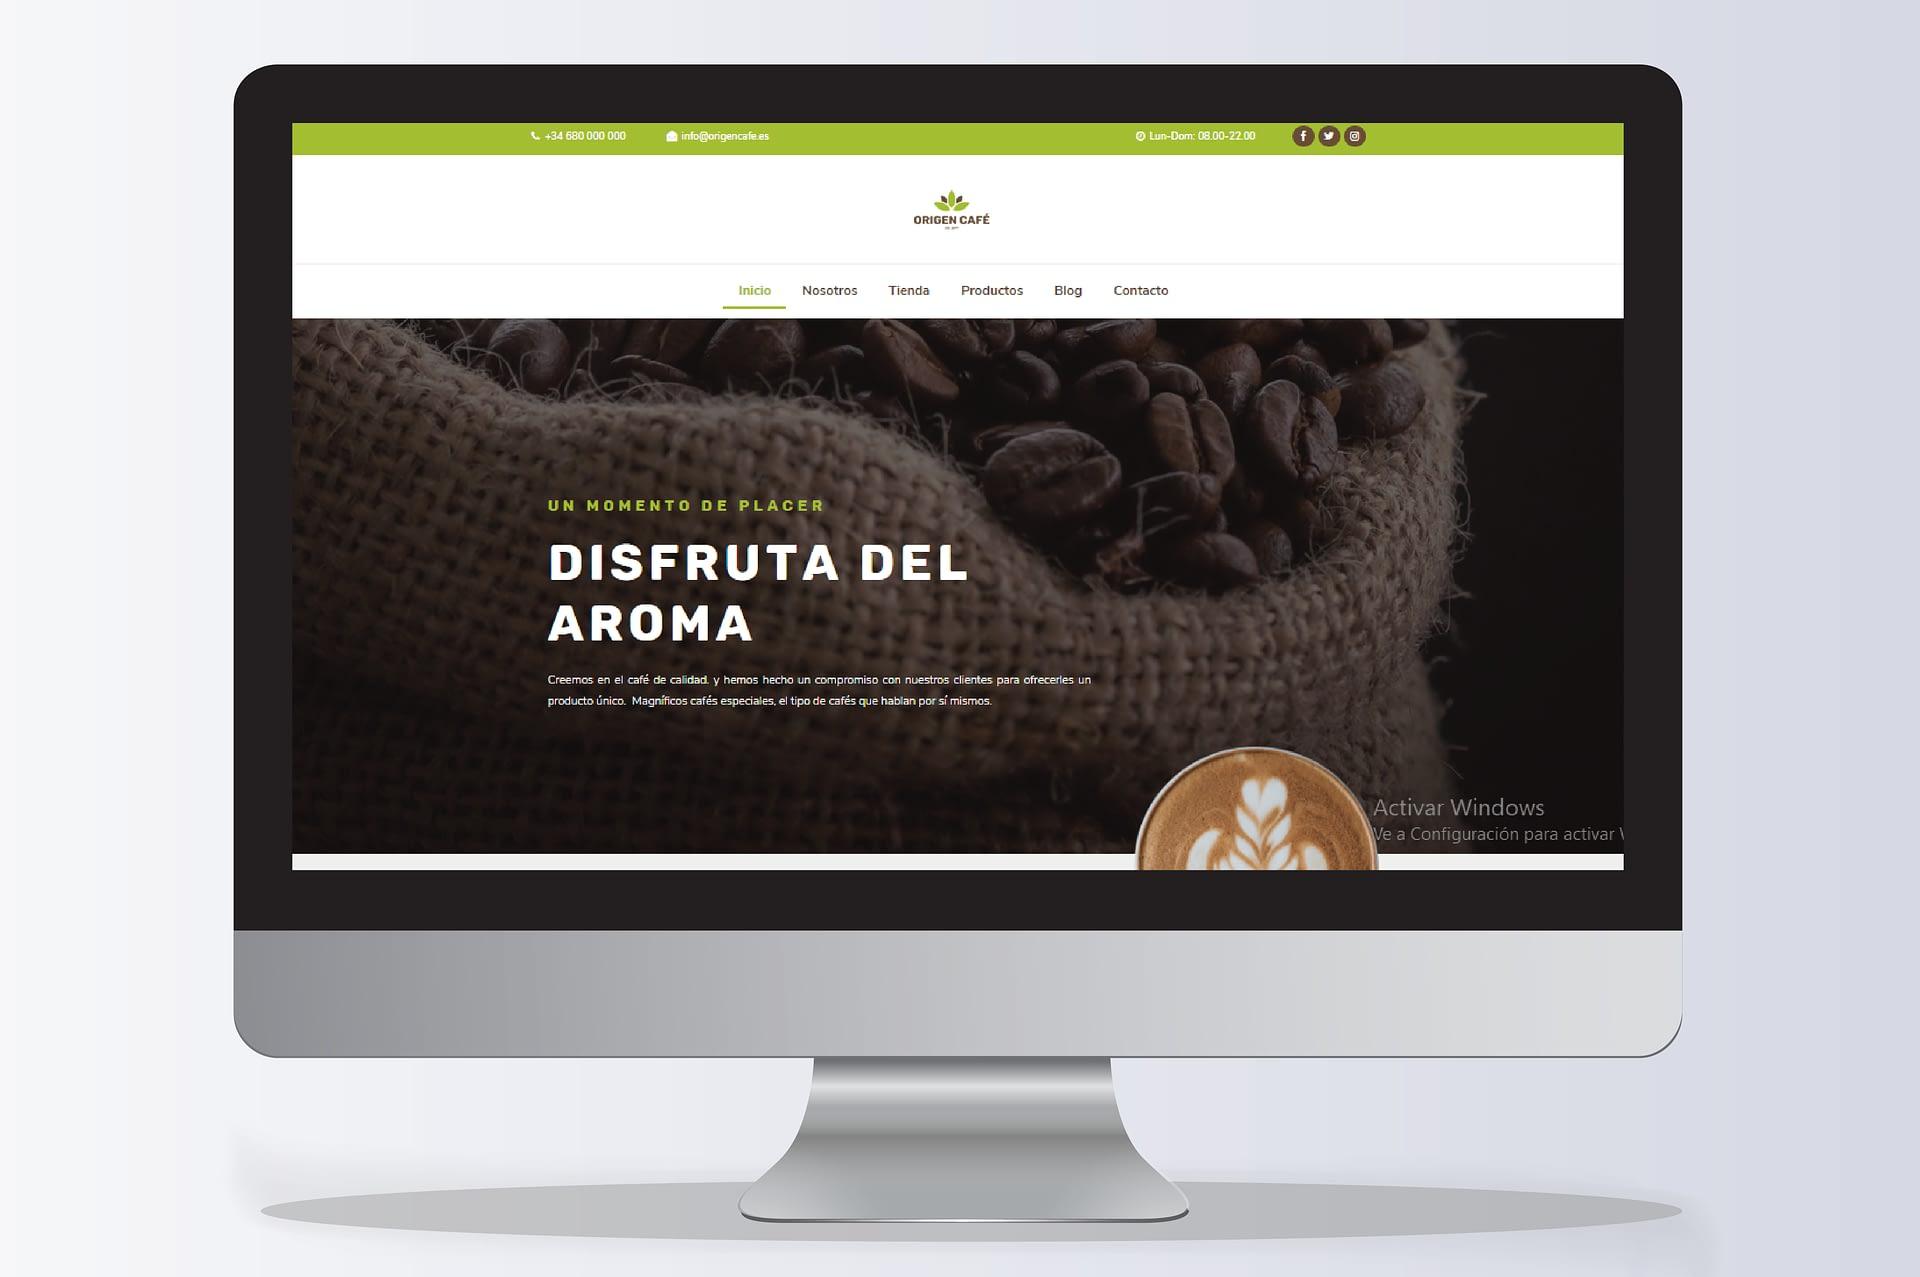 Diseño Web Tenerife Origen Cafe imeelz - Trabajos